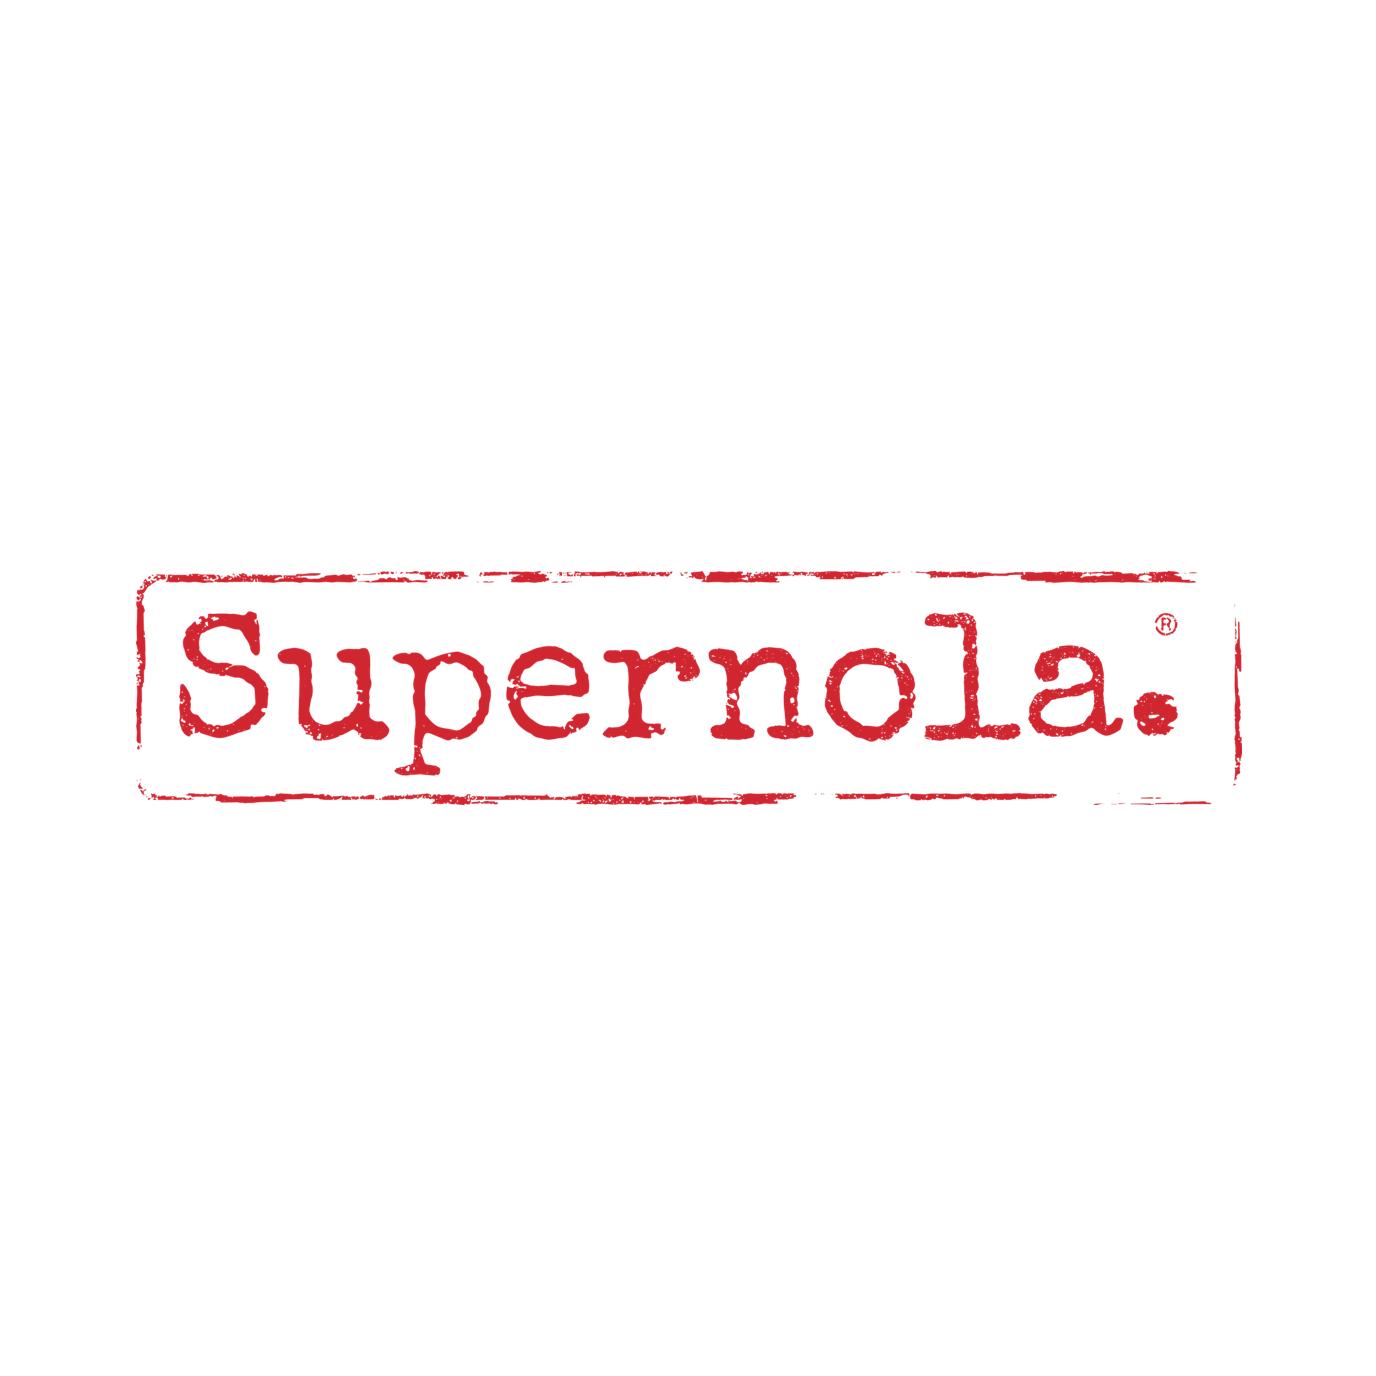 Supernola Logo - Certified Paleo, Keto Certified by the Paleo Foundation